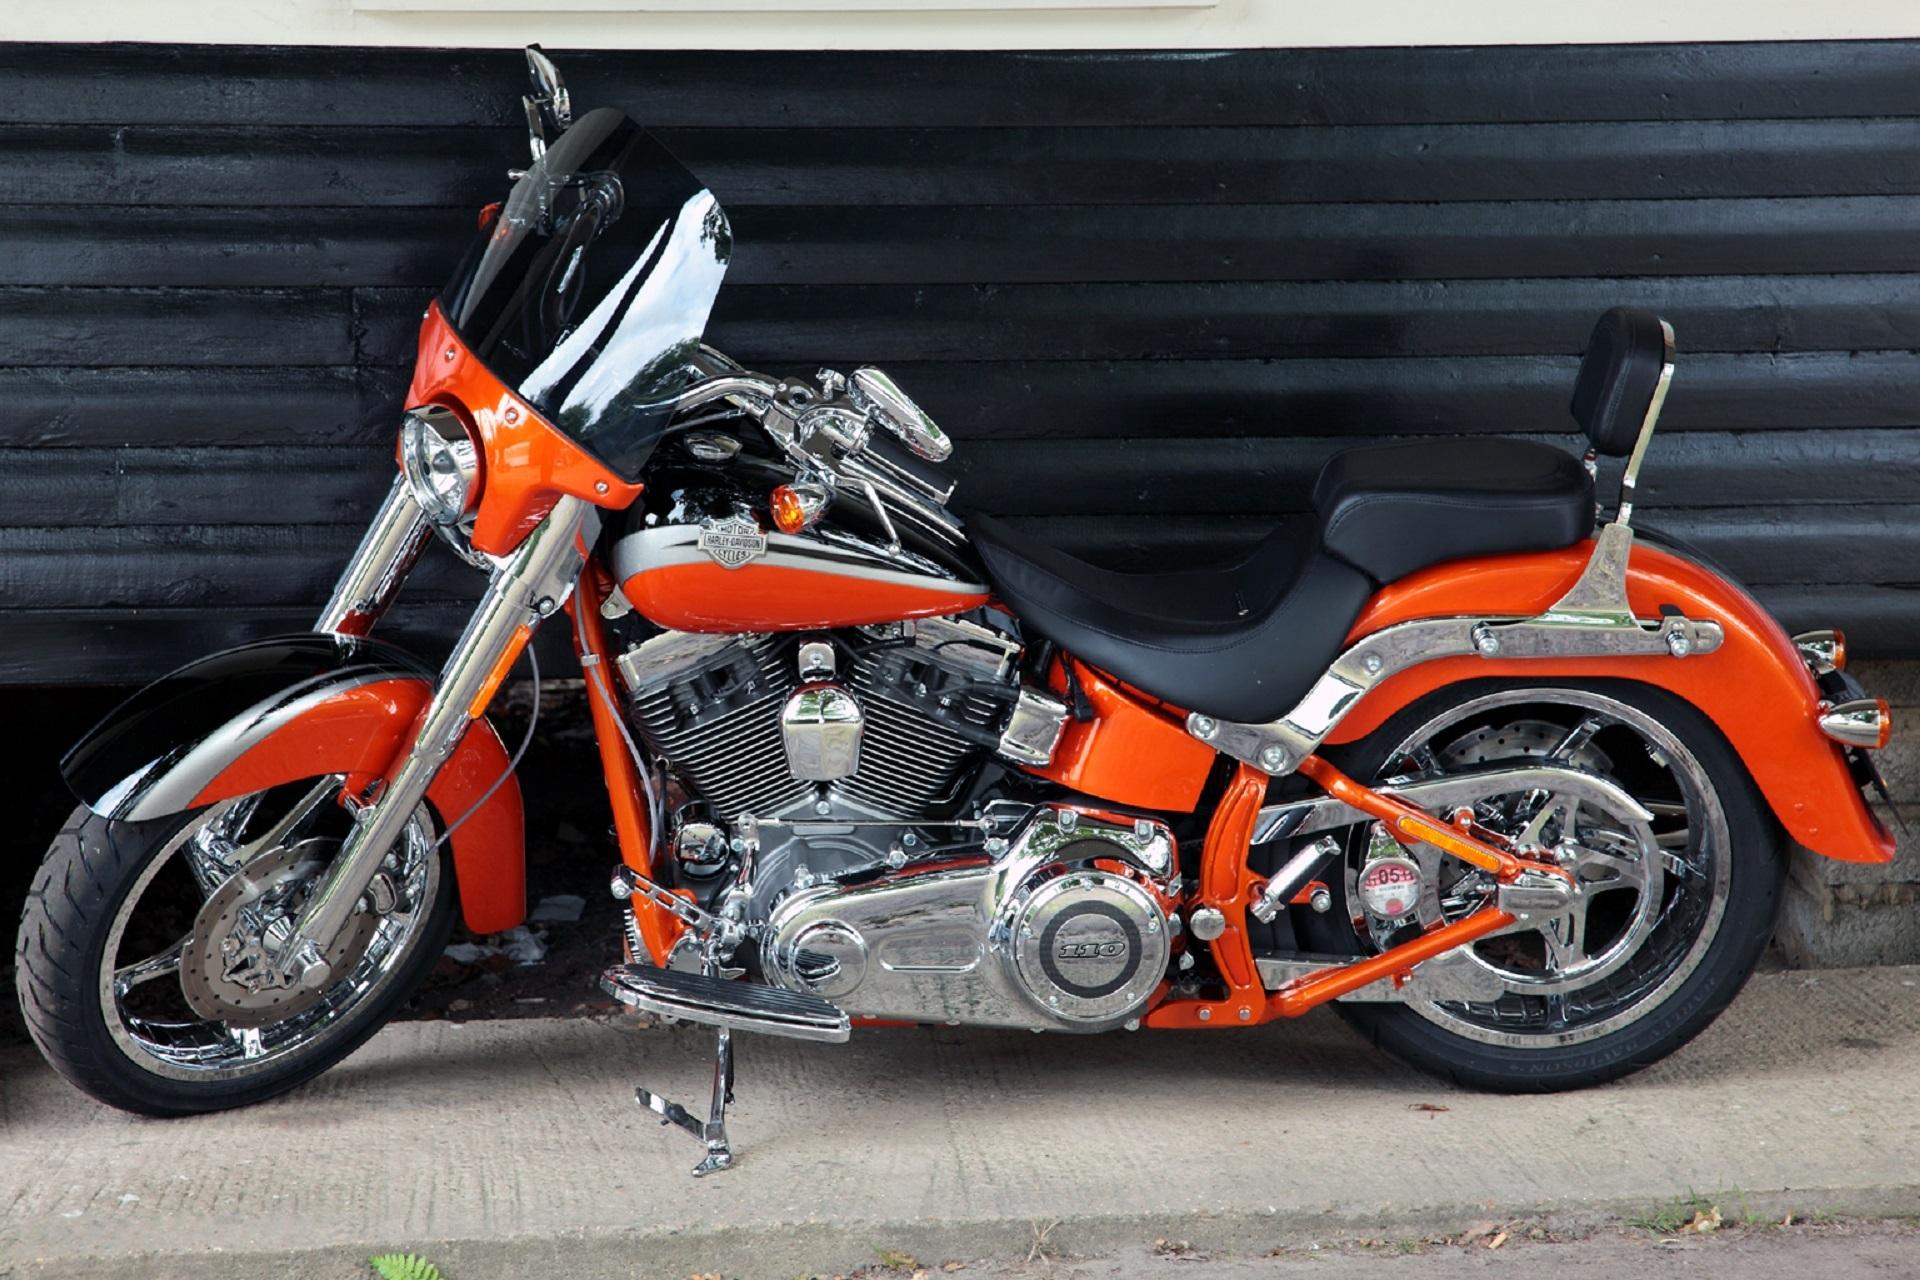 Harley Davidson, Bike, Davidson, Harley, Motor, HQ Photo